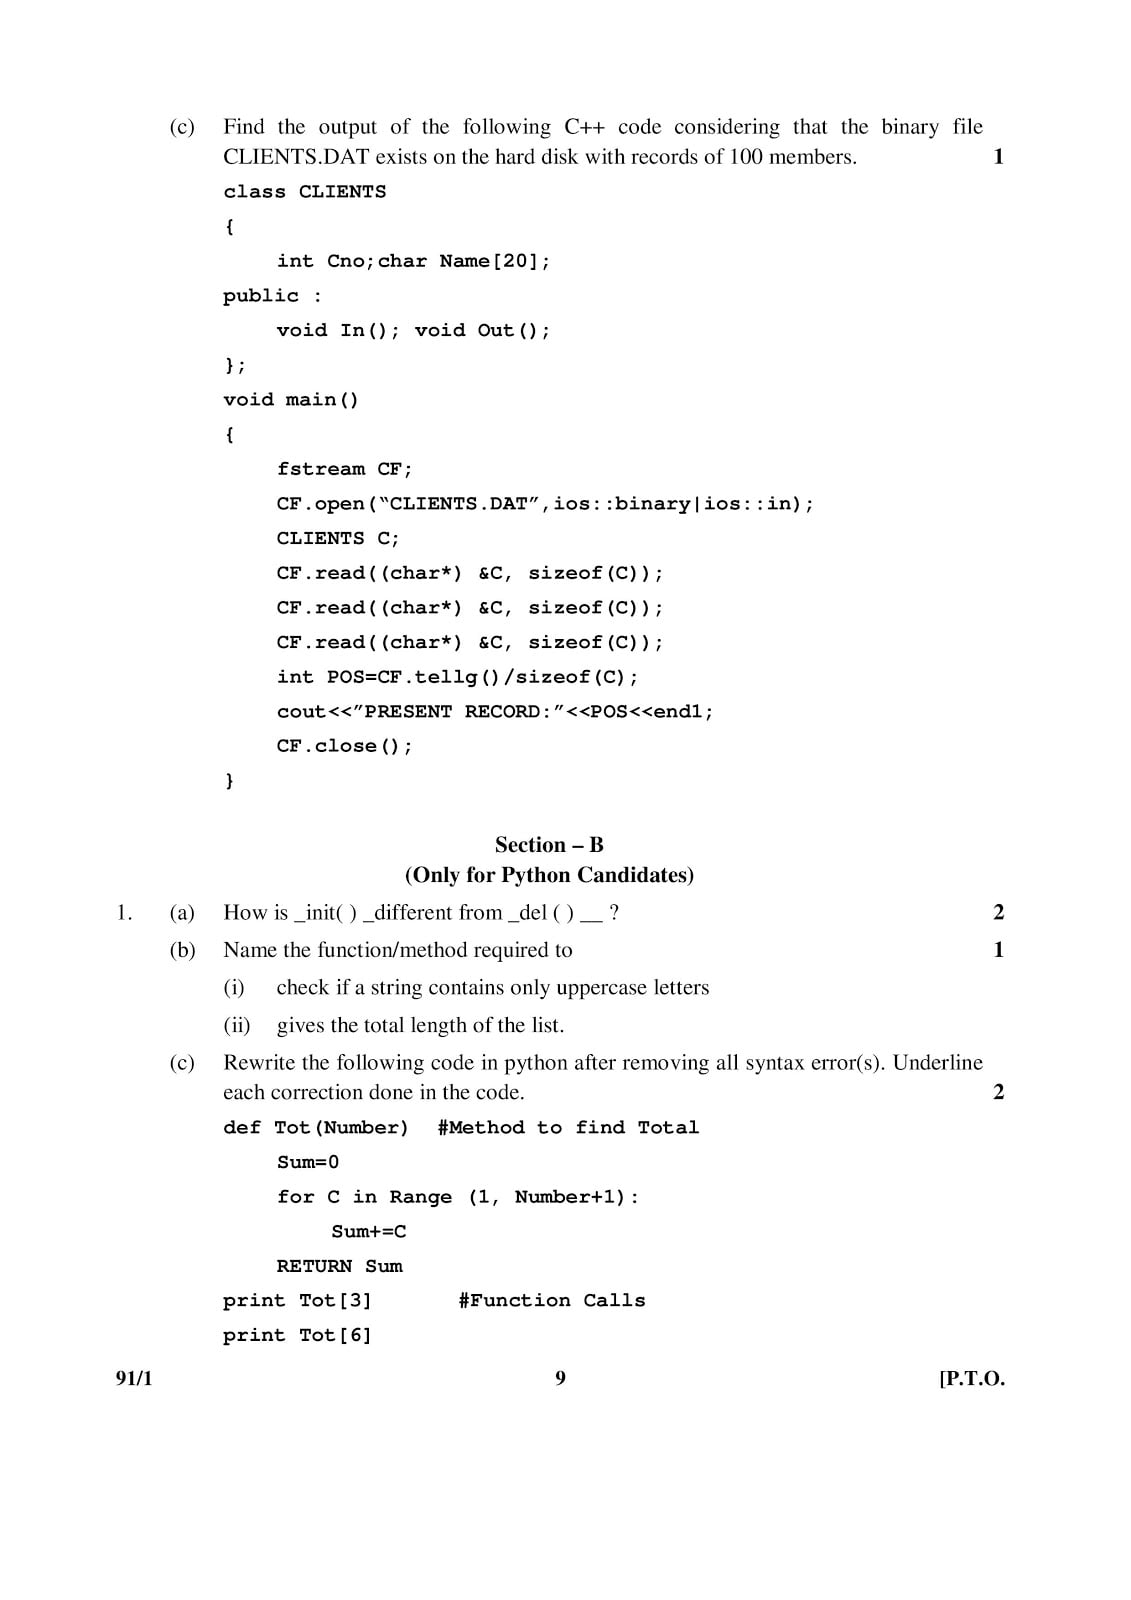 CBSE Class 12 Computer Science 2015 Question Paper